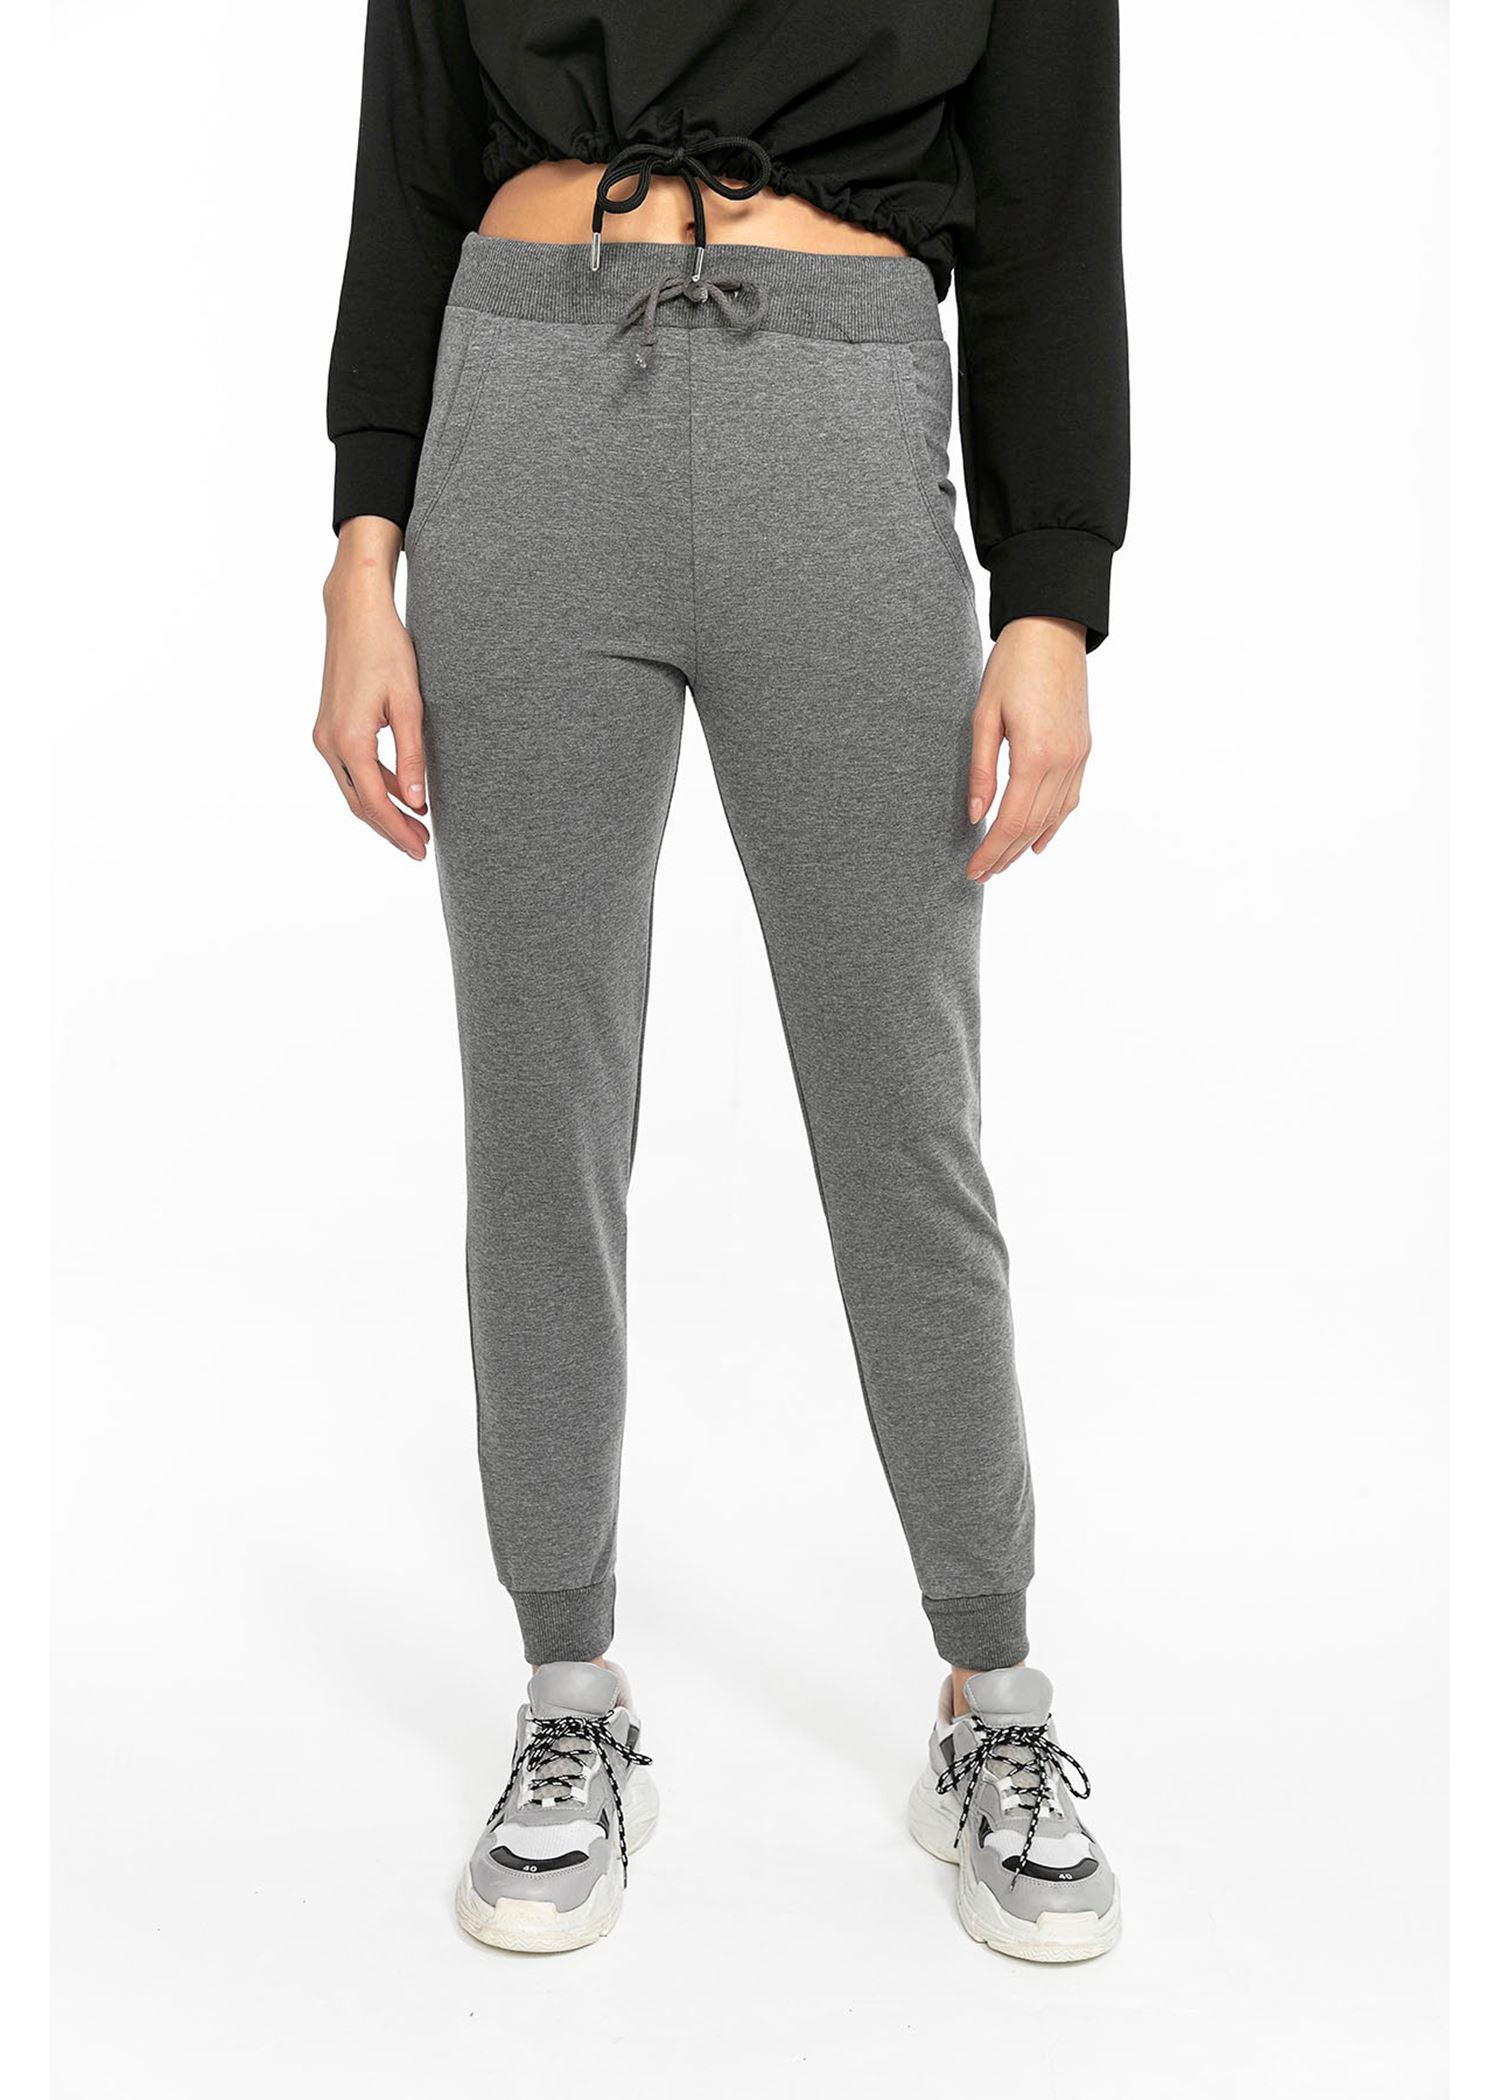 Women's Smoky Two Ply Sport Pants